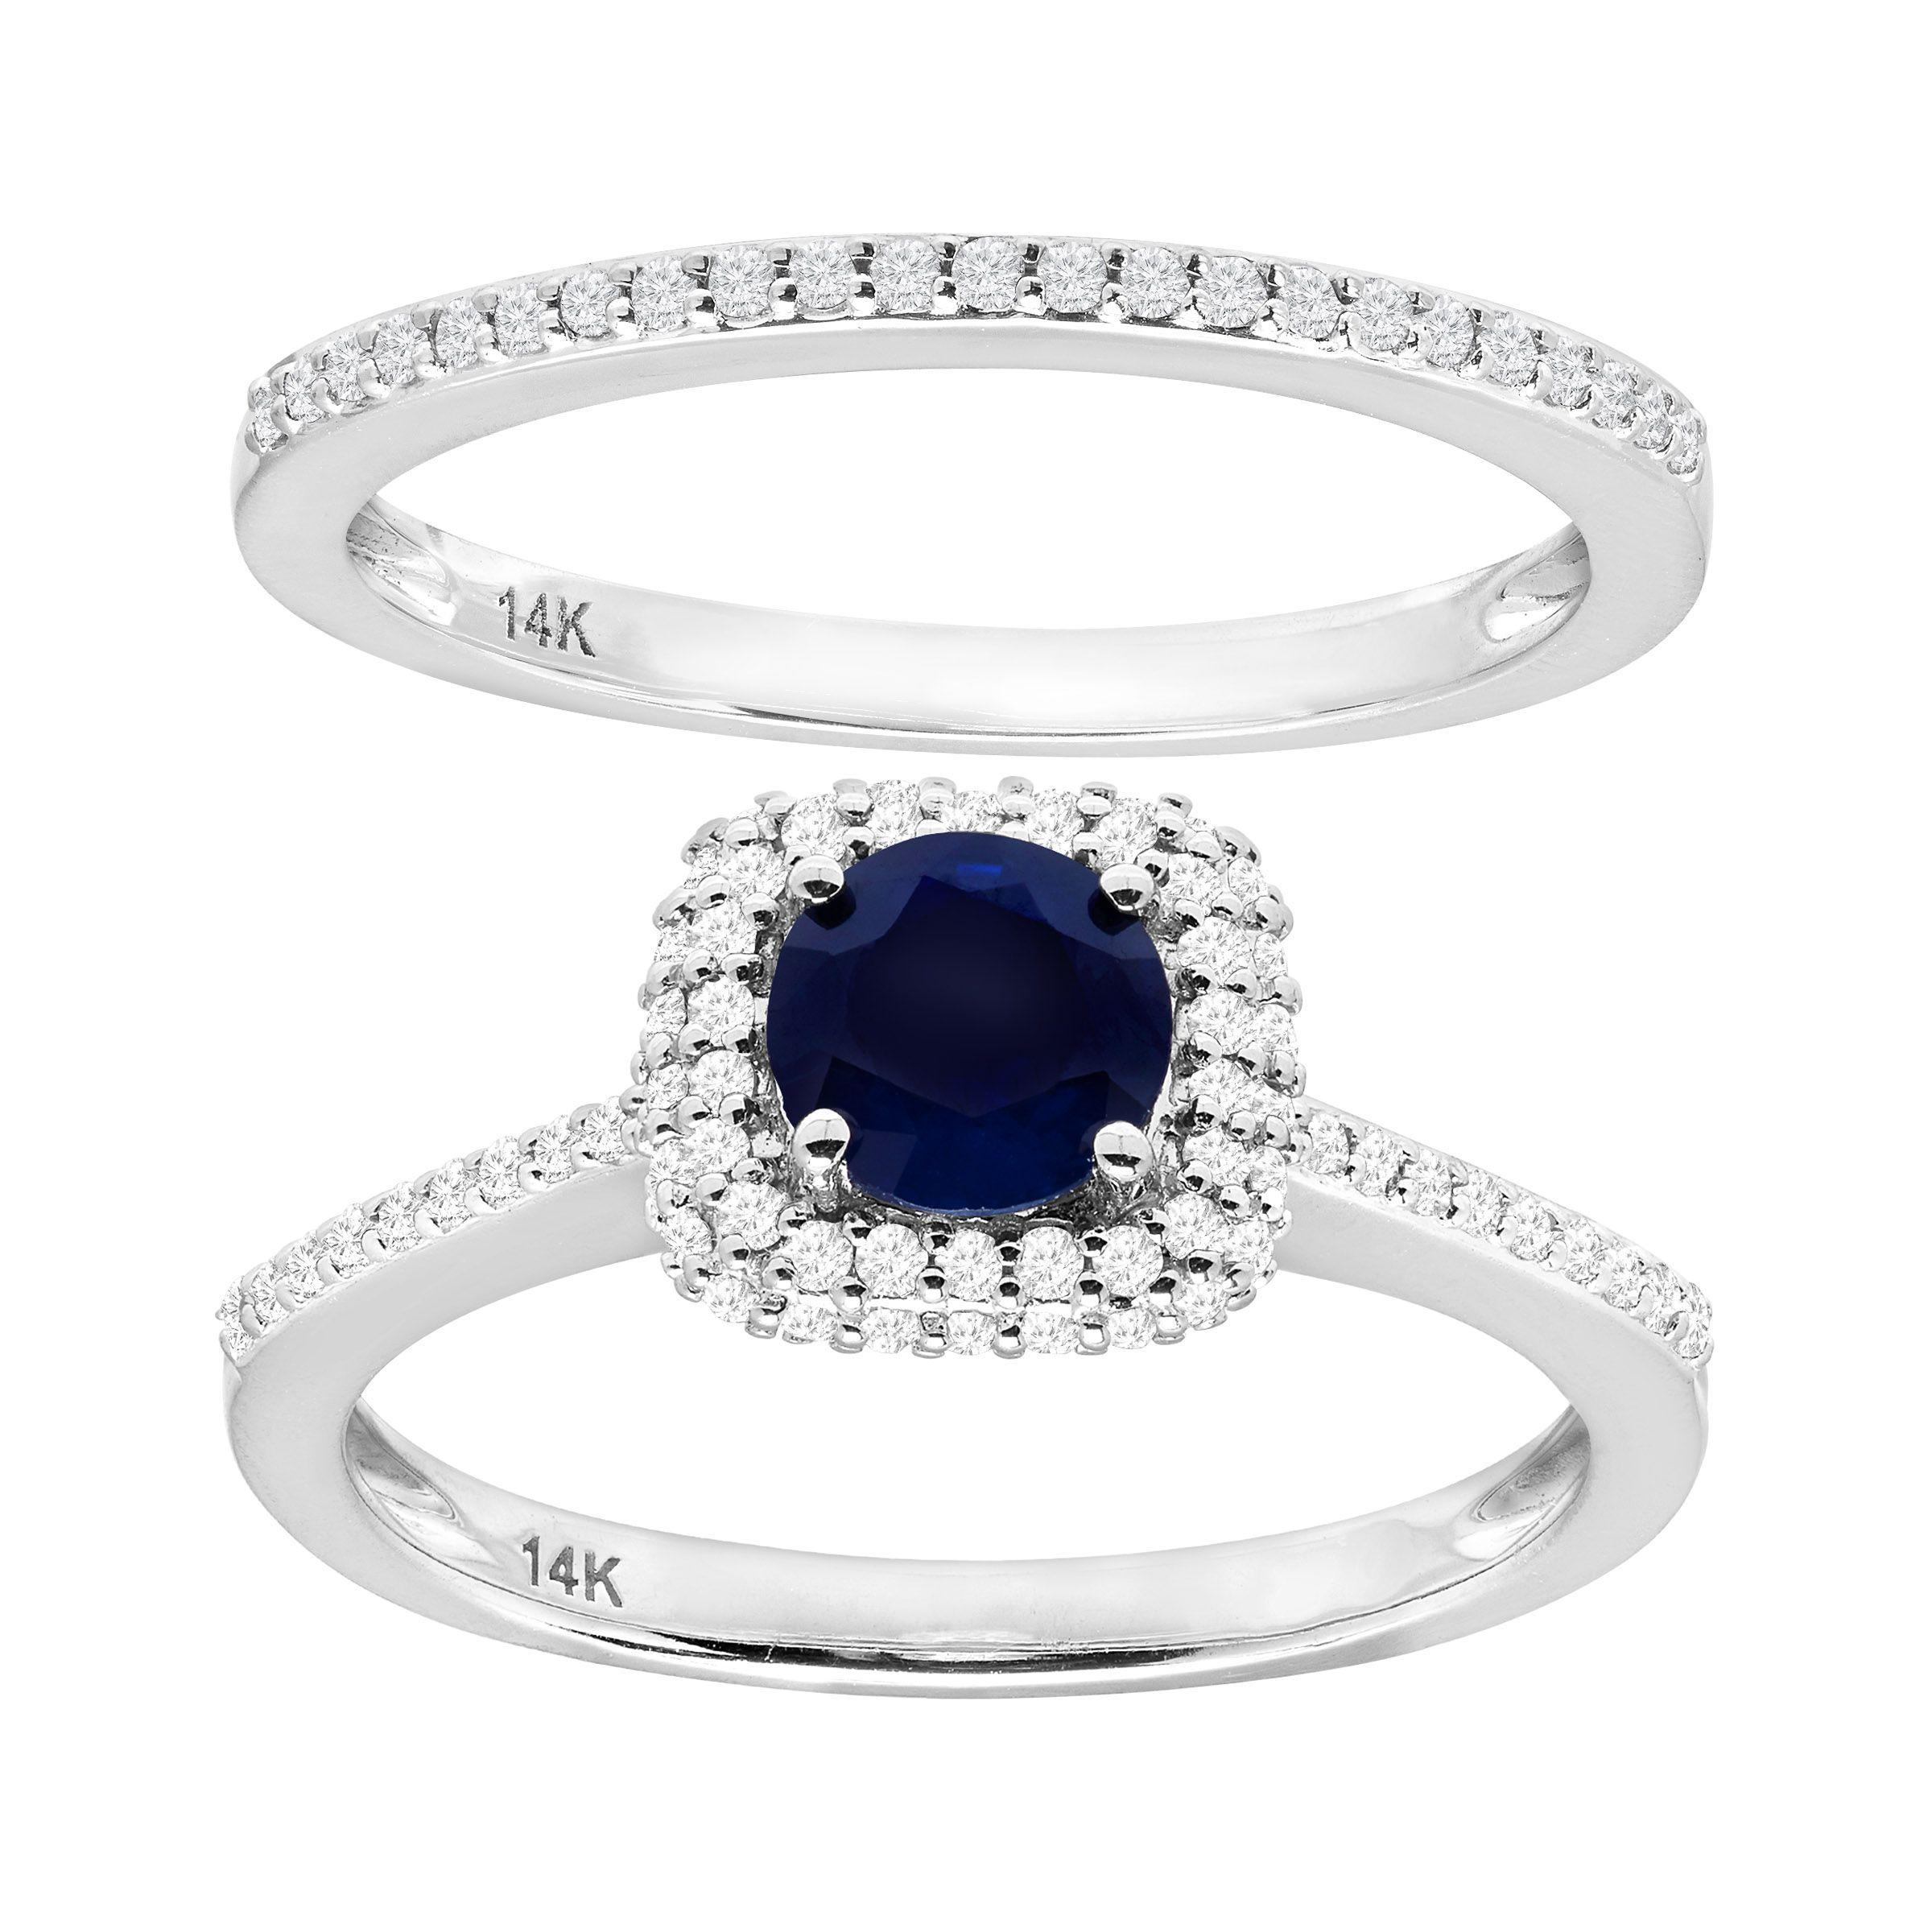 78 Ct Natural Shire Amp 12 Diamond Engagement Ring